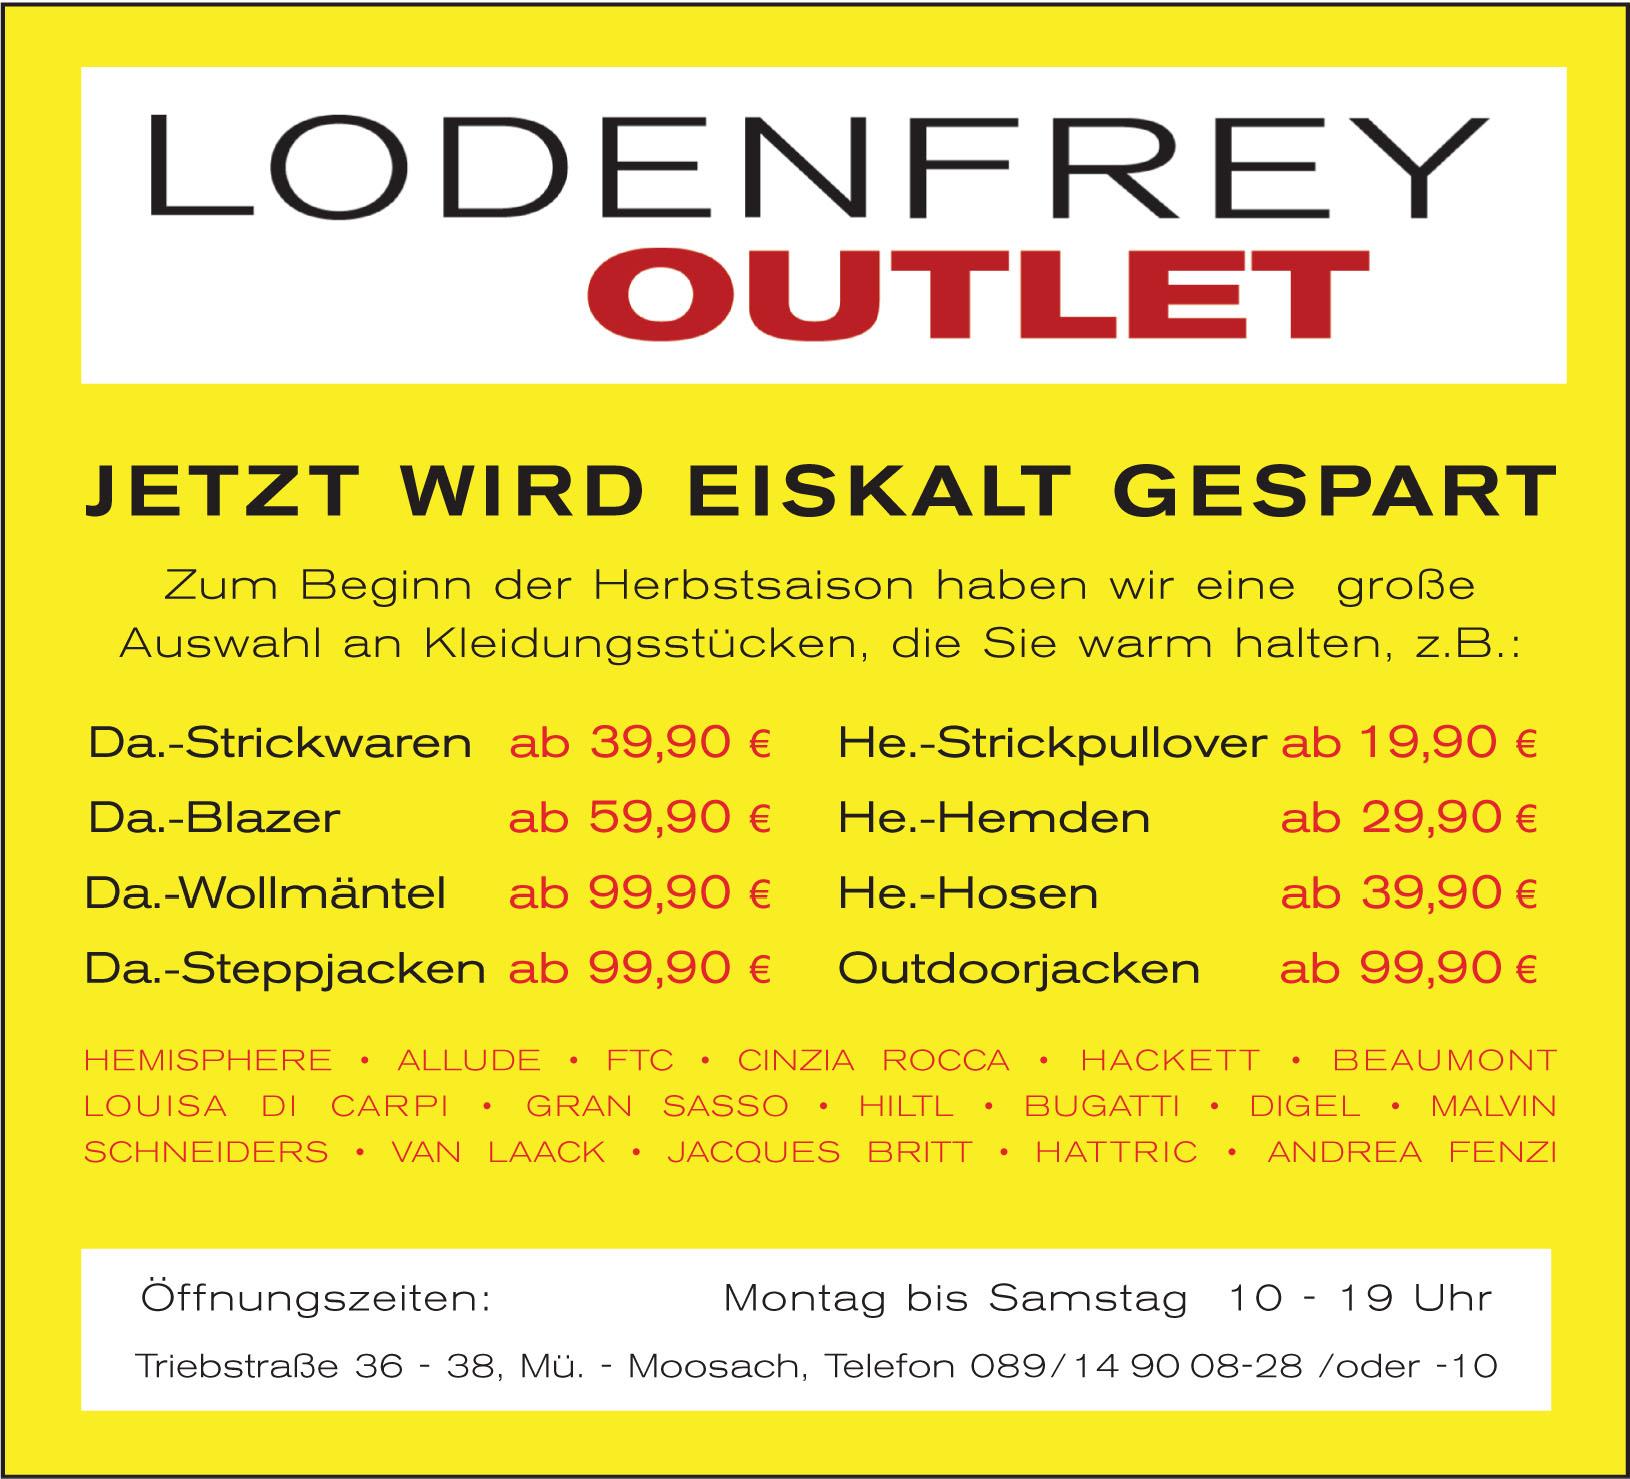 Lodenfrey Outlet